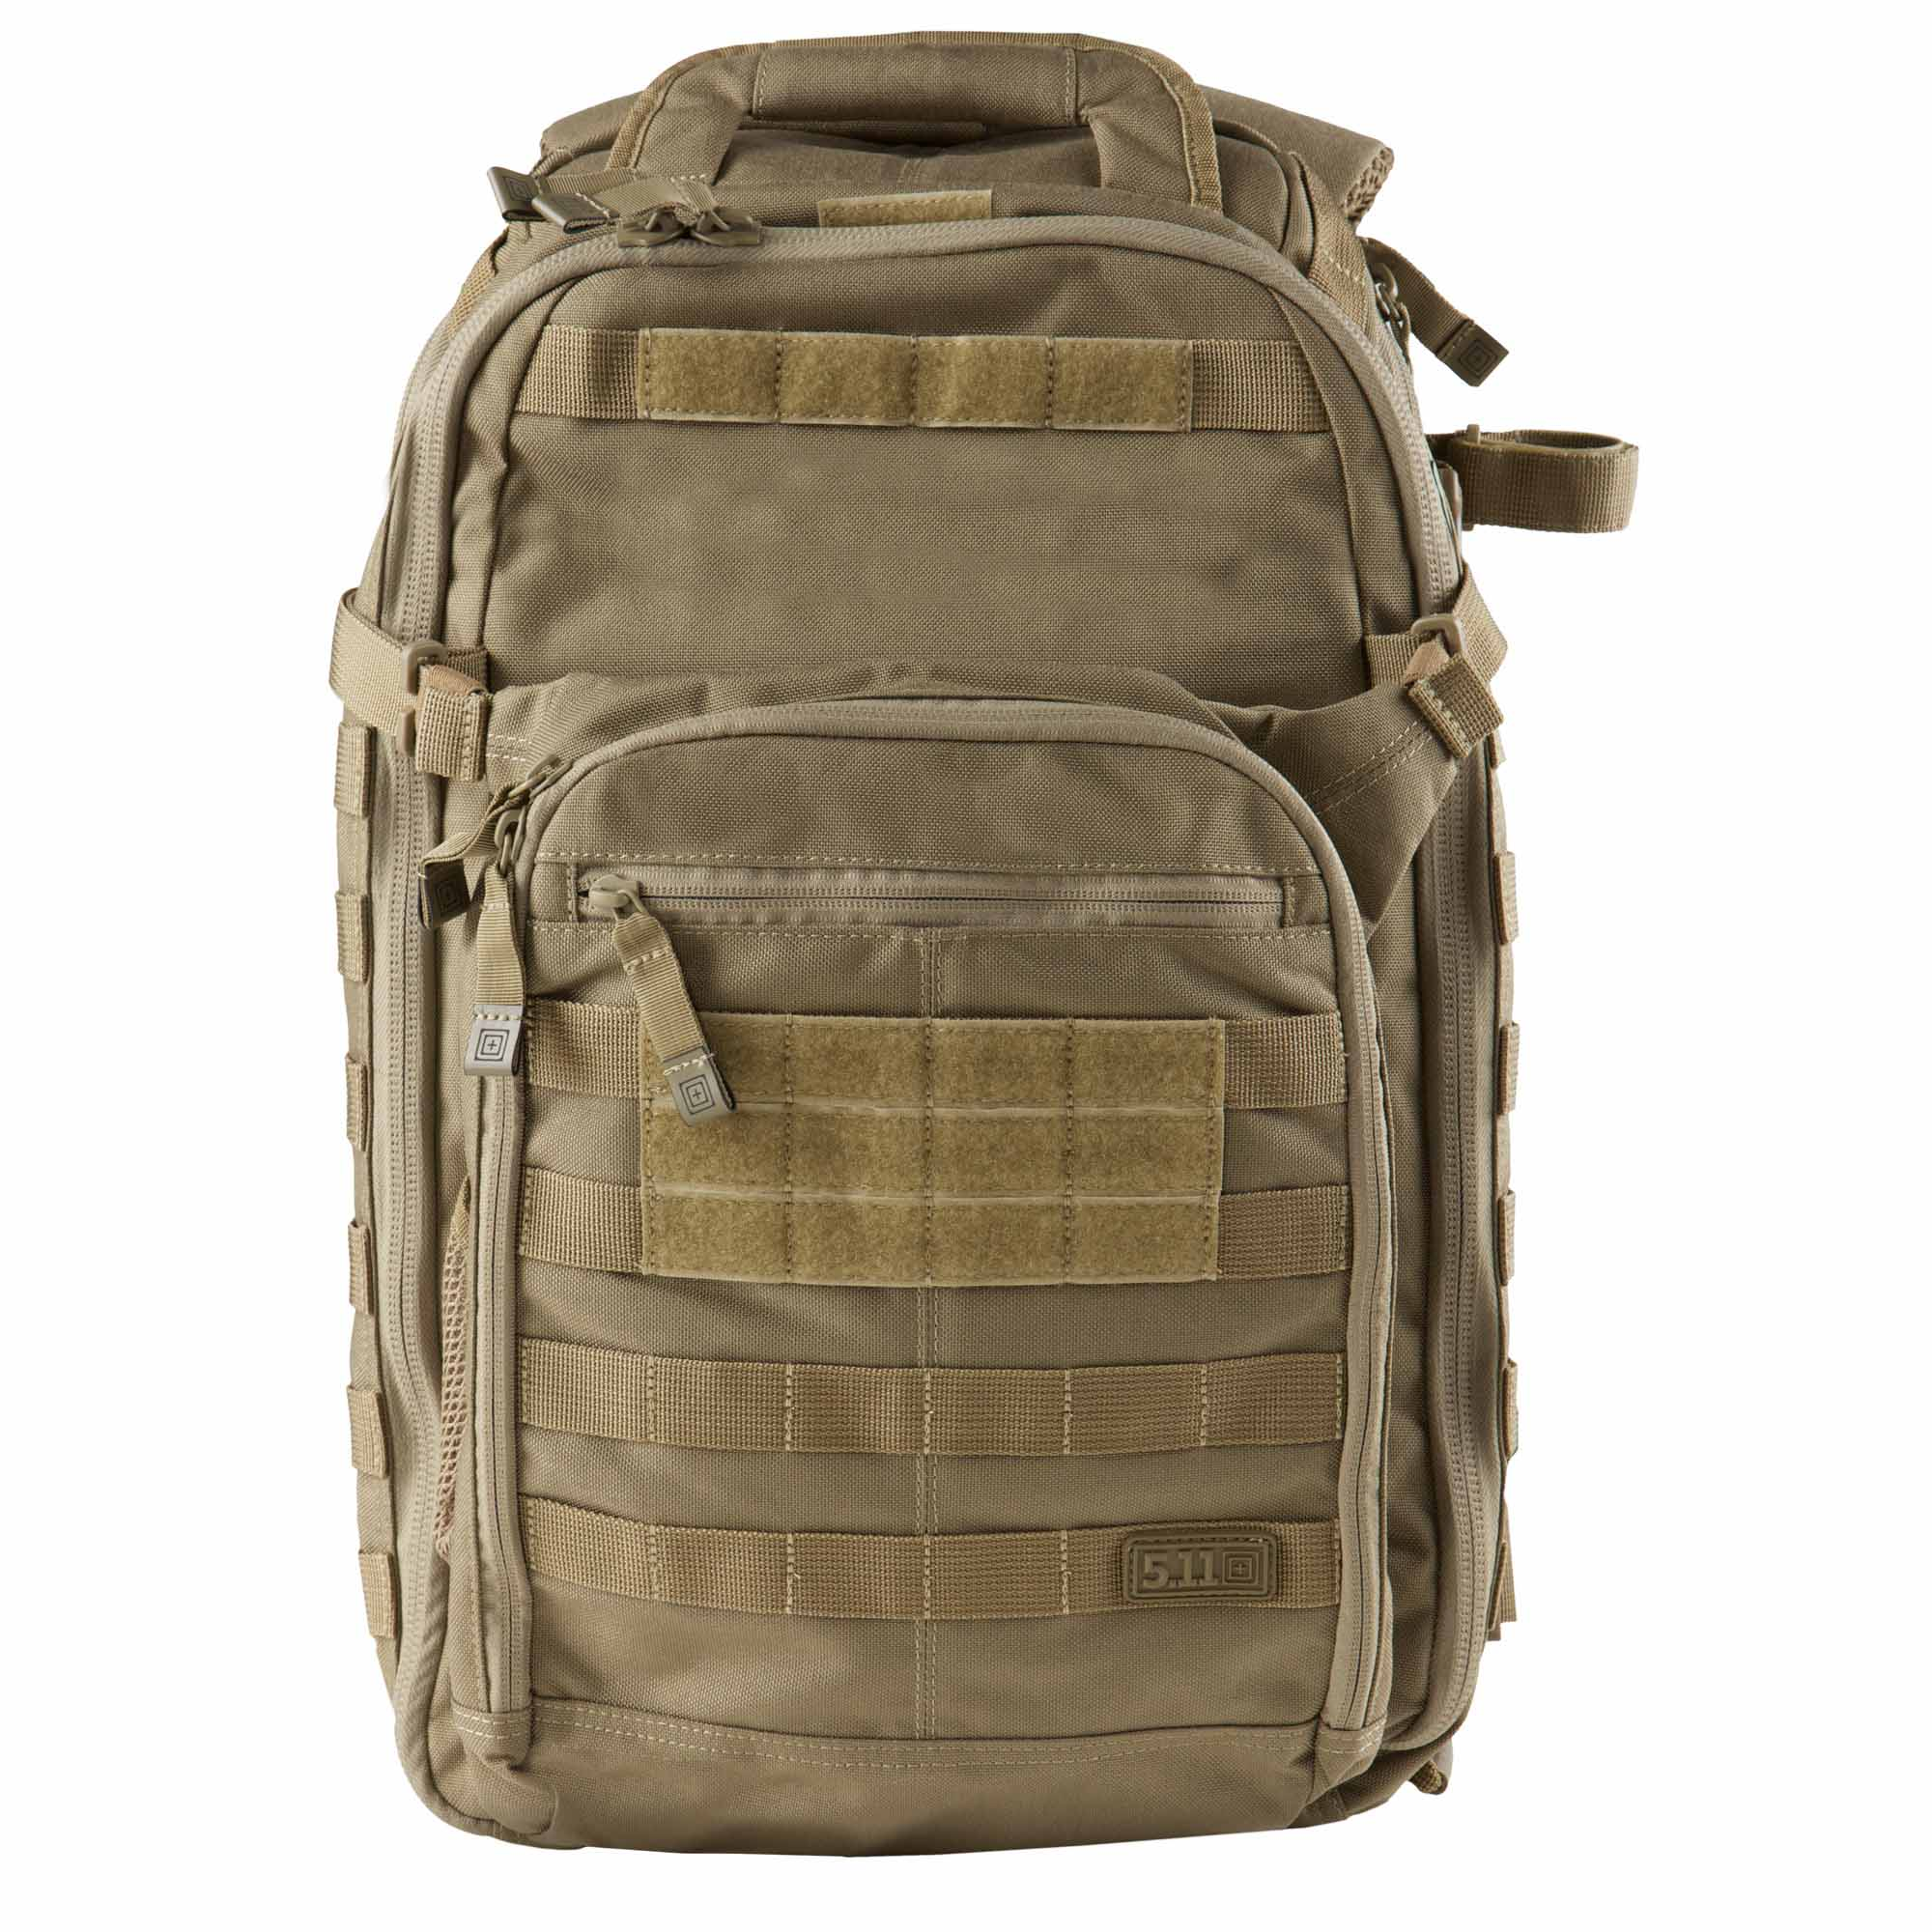 267c5e01cb 5.11 Tactical RUSH 24 Tactical Backpack - 5.11 Tactical